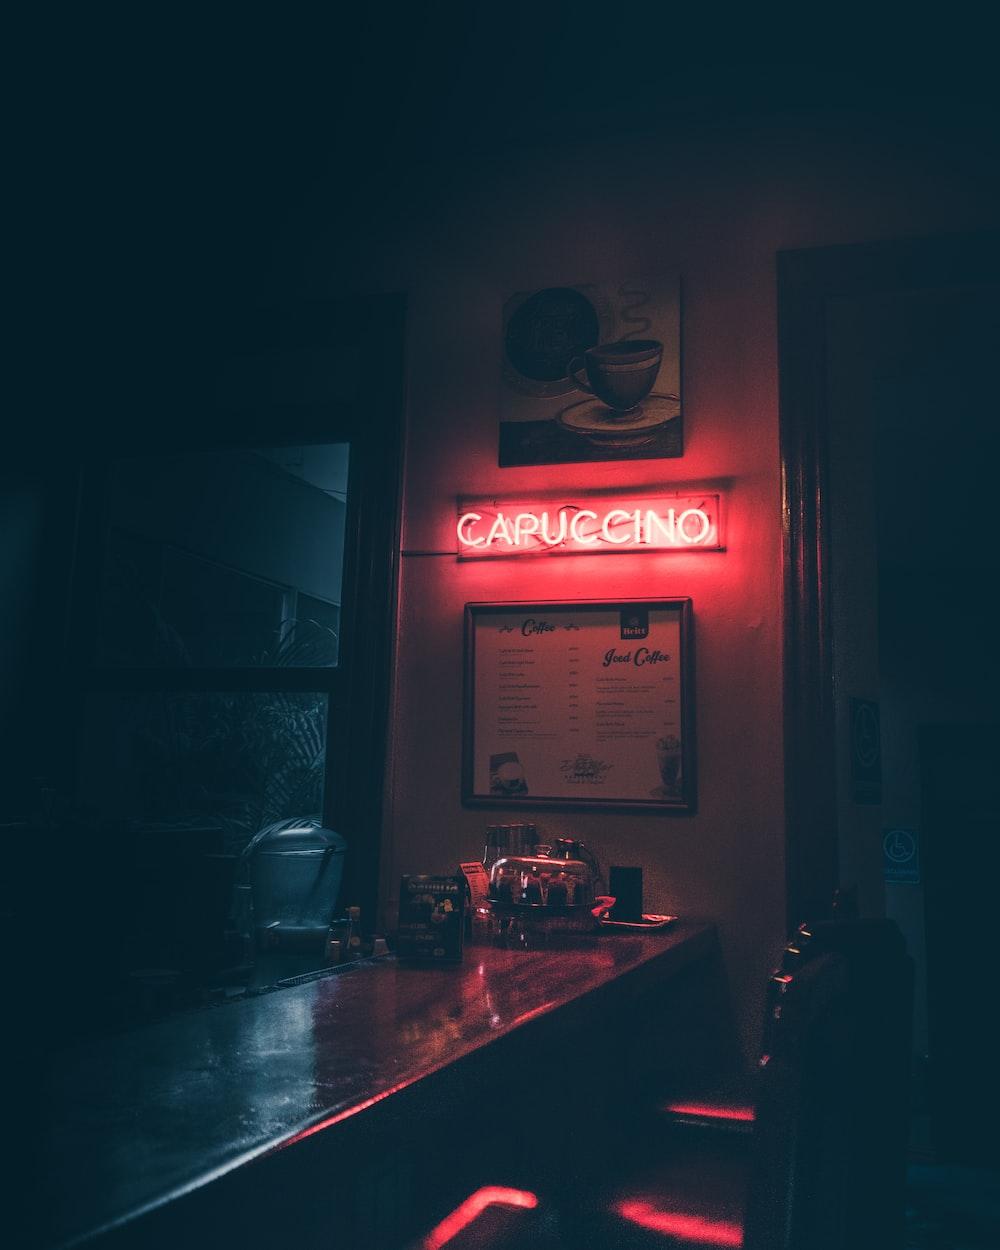 Capuccino neon signage